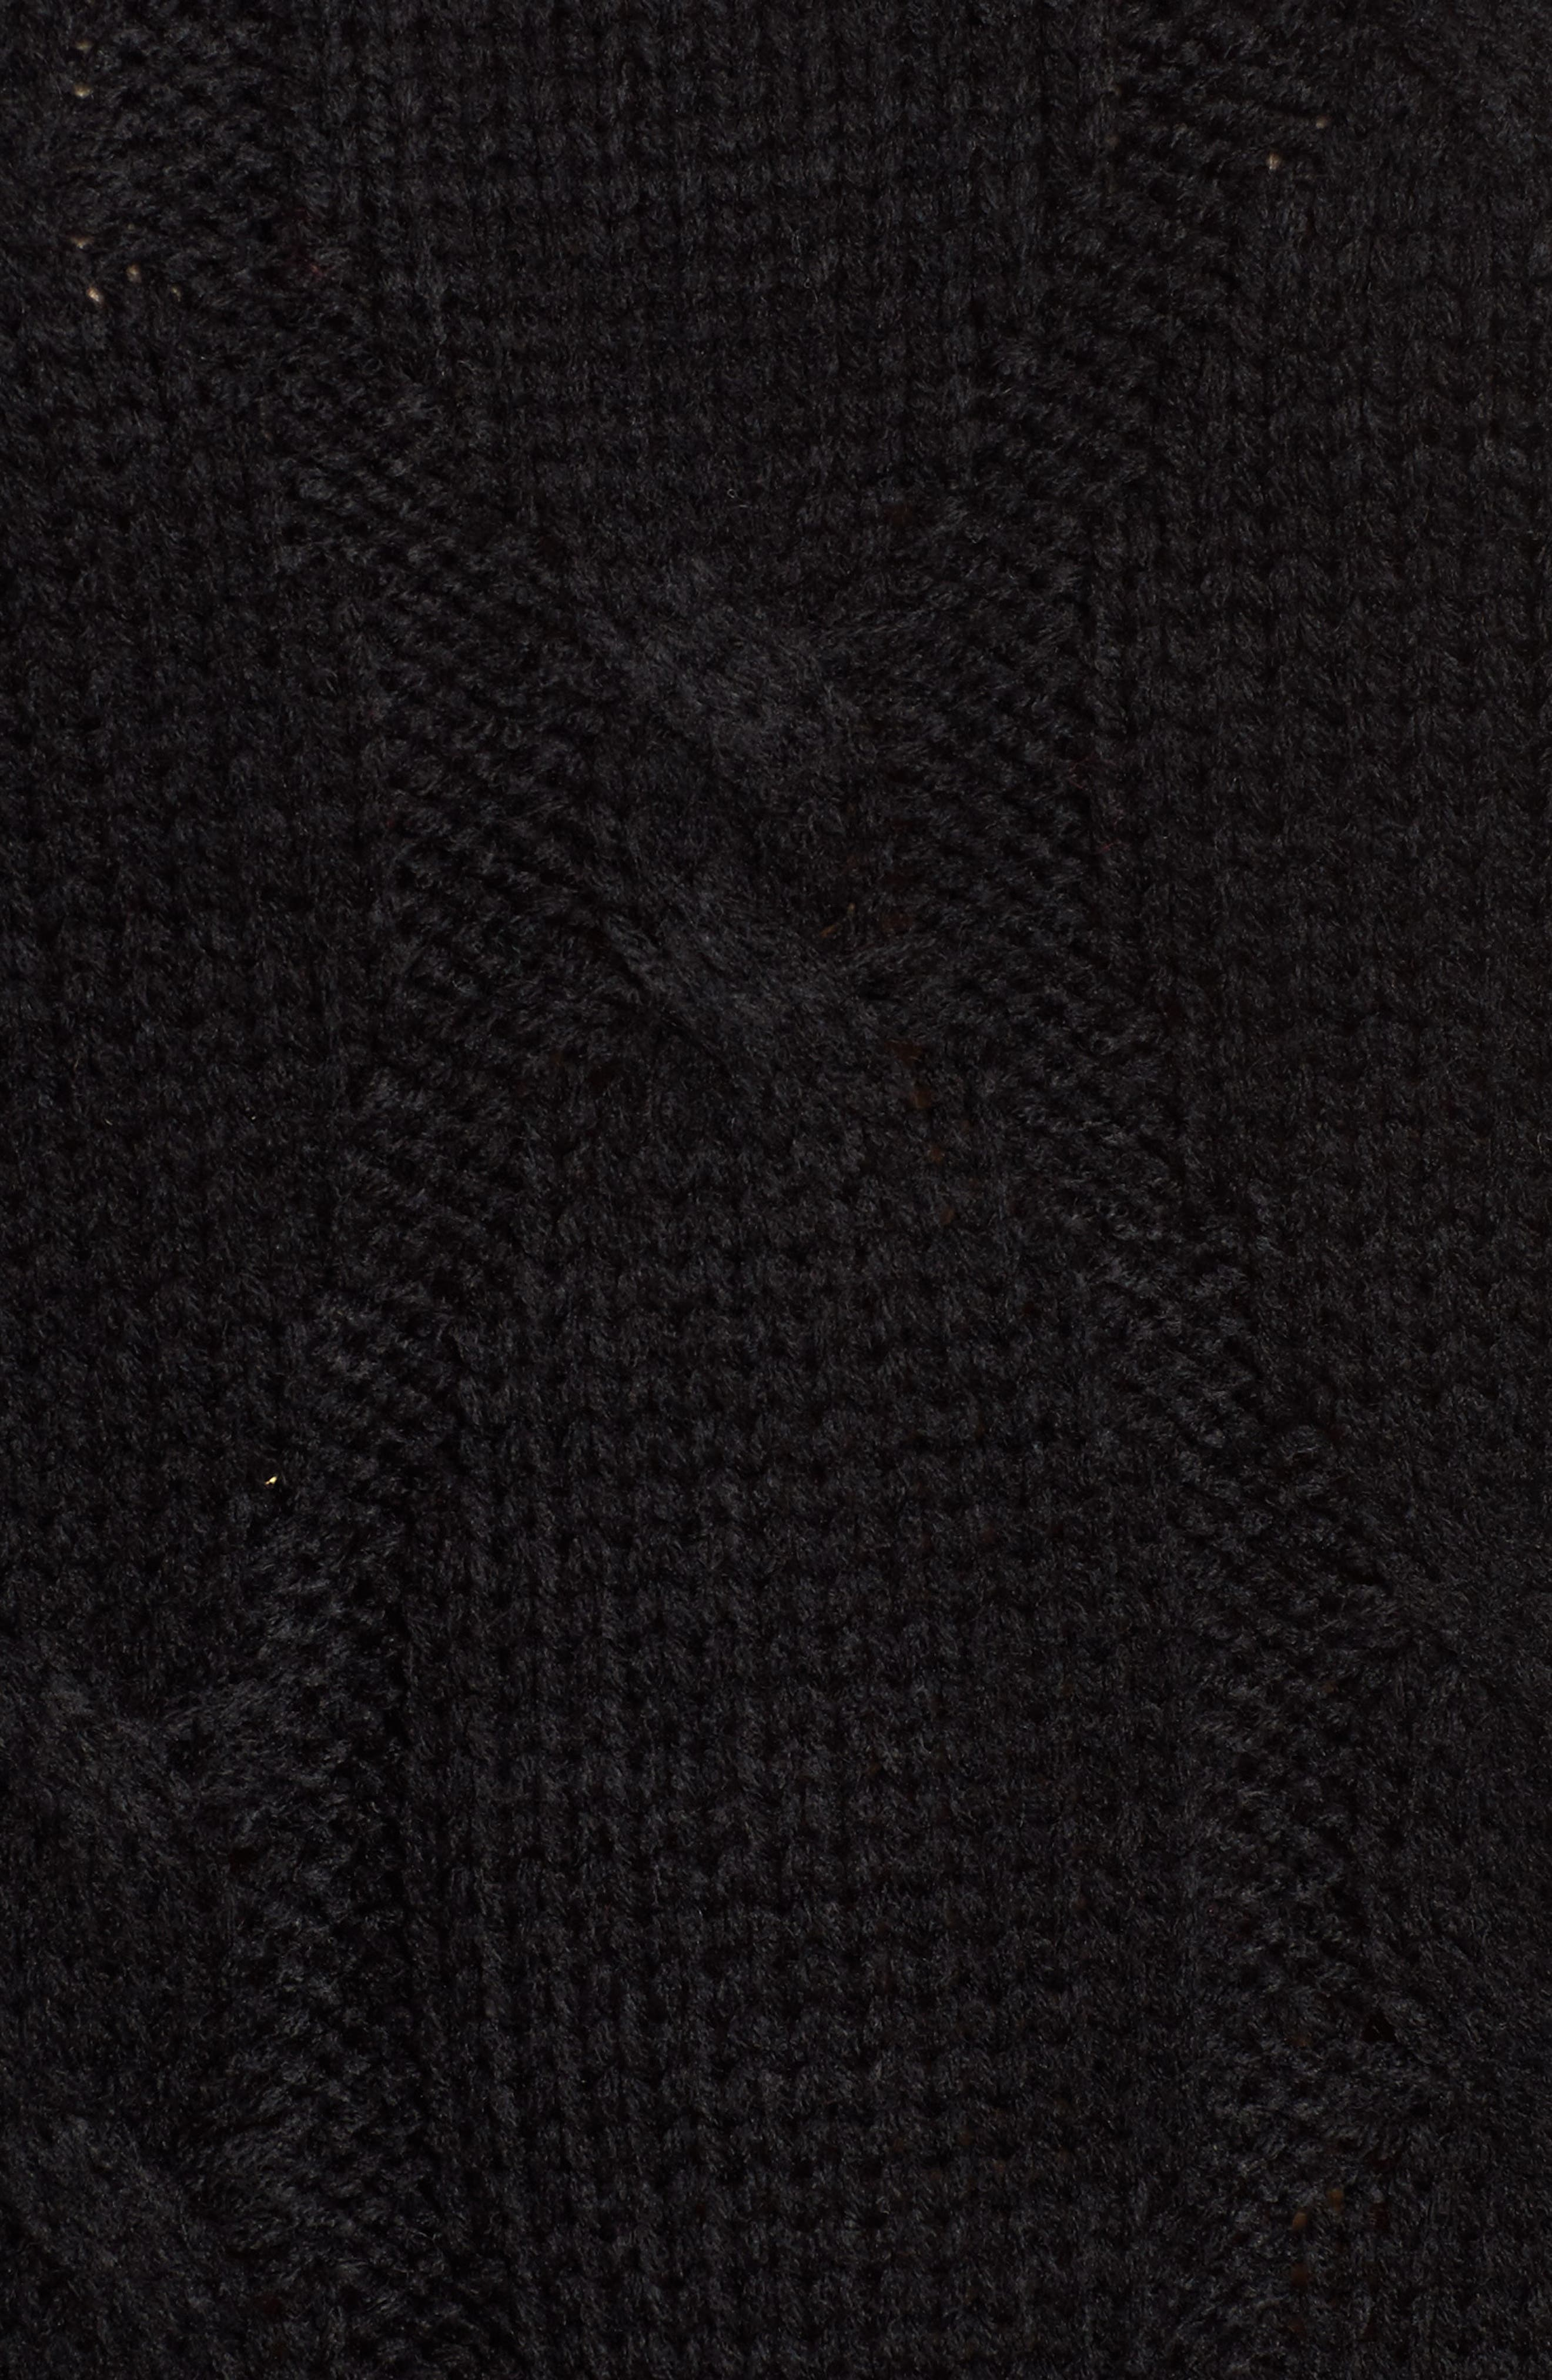 Cold Shoulder Cable Sweater,                             Alternate thumbnail 5, color,                             Black